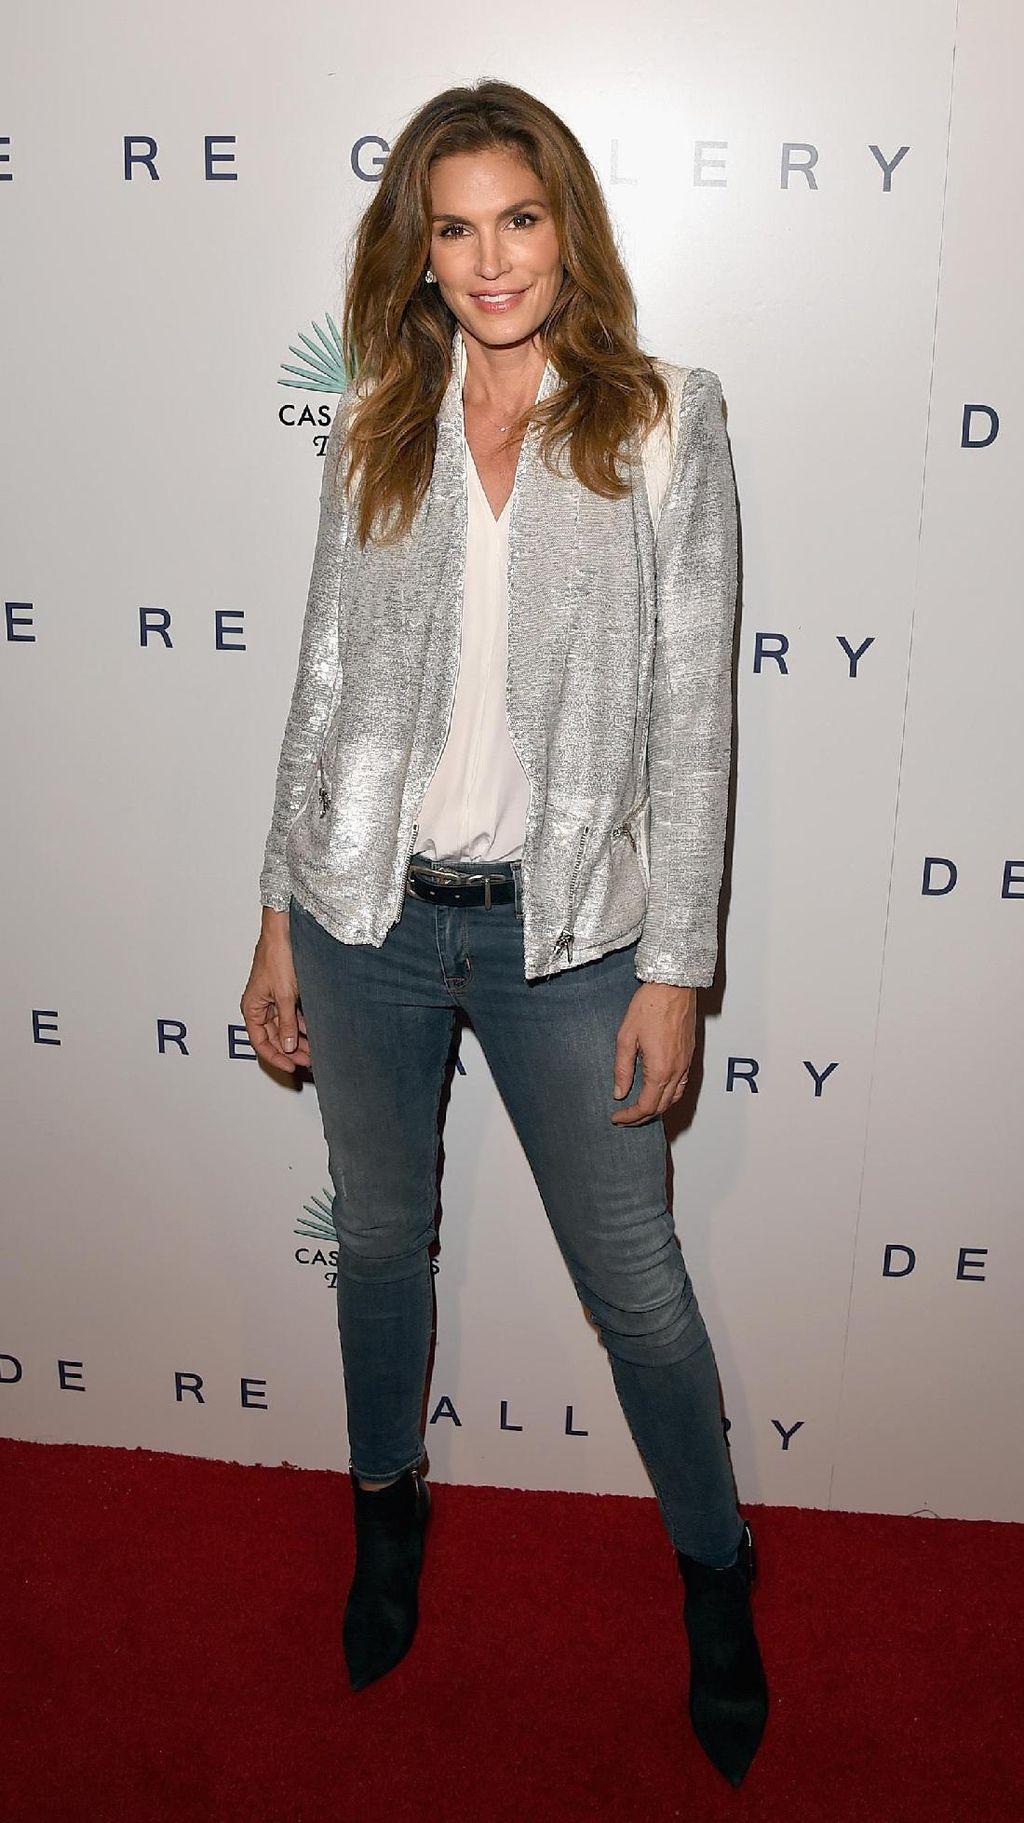 Foto: Penampilan Stylish Cindy Crawford, Si Mantan Supermodel